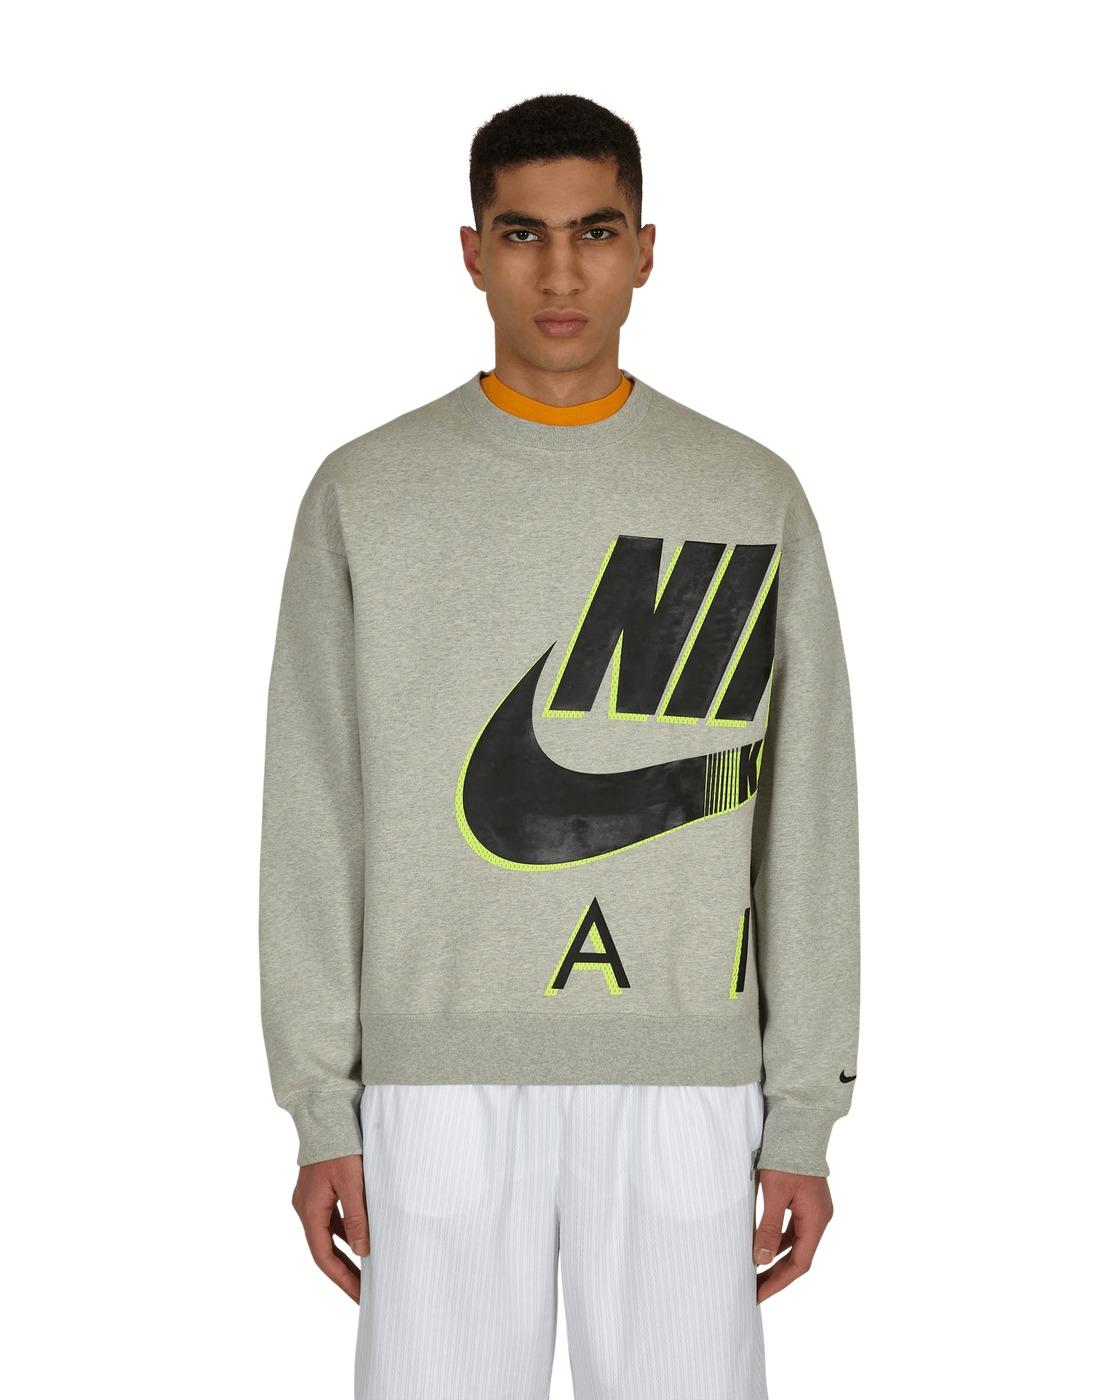 Nike Special Project Kim Jones Crewneck Sweatshirt Grey Heather